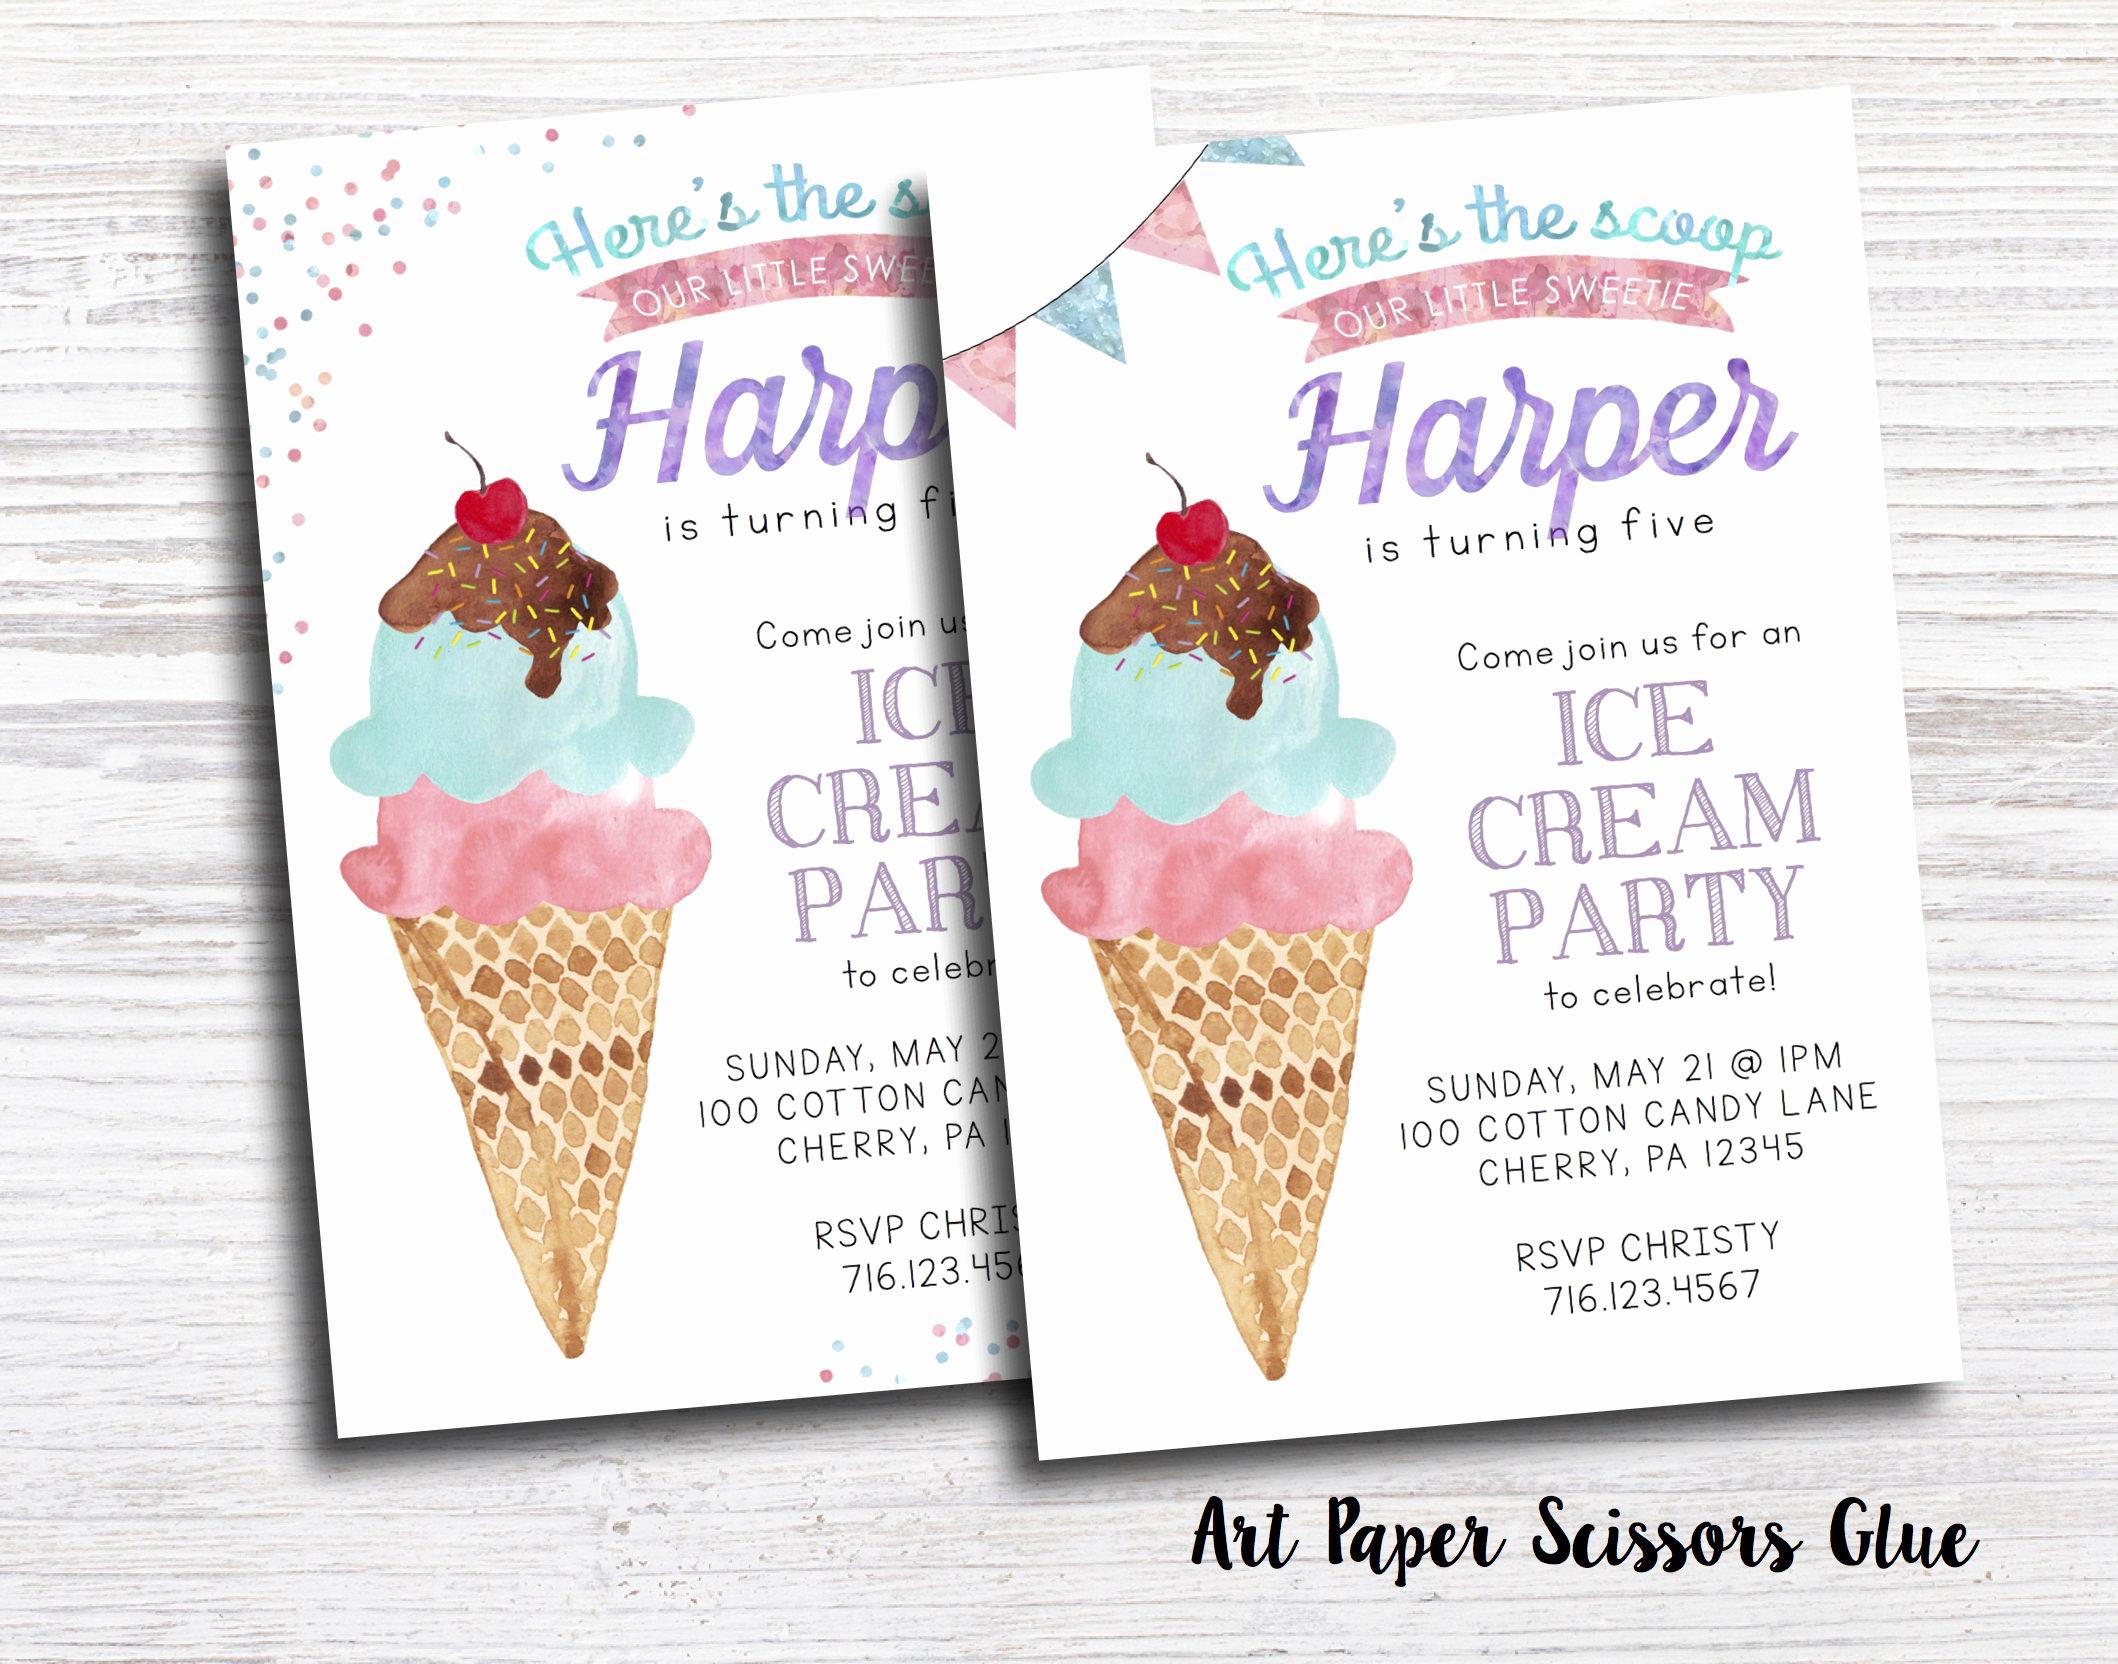 Ice Cream social Invitation Awesome Ice Cream Party Invitations Ice Cream social Invitations Ice